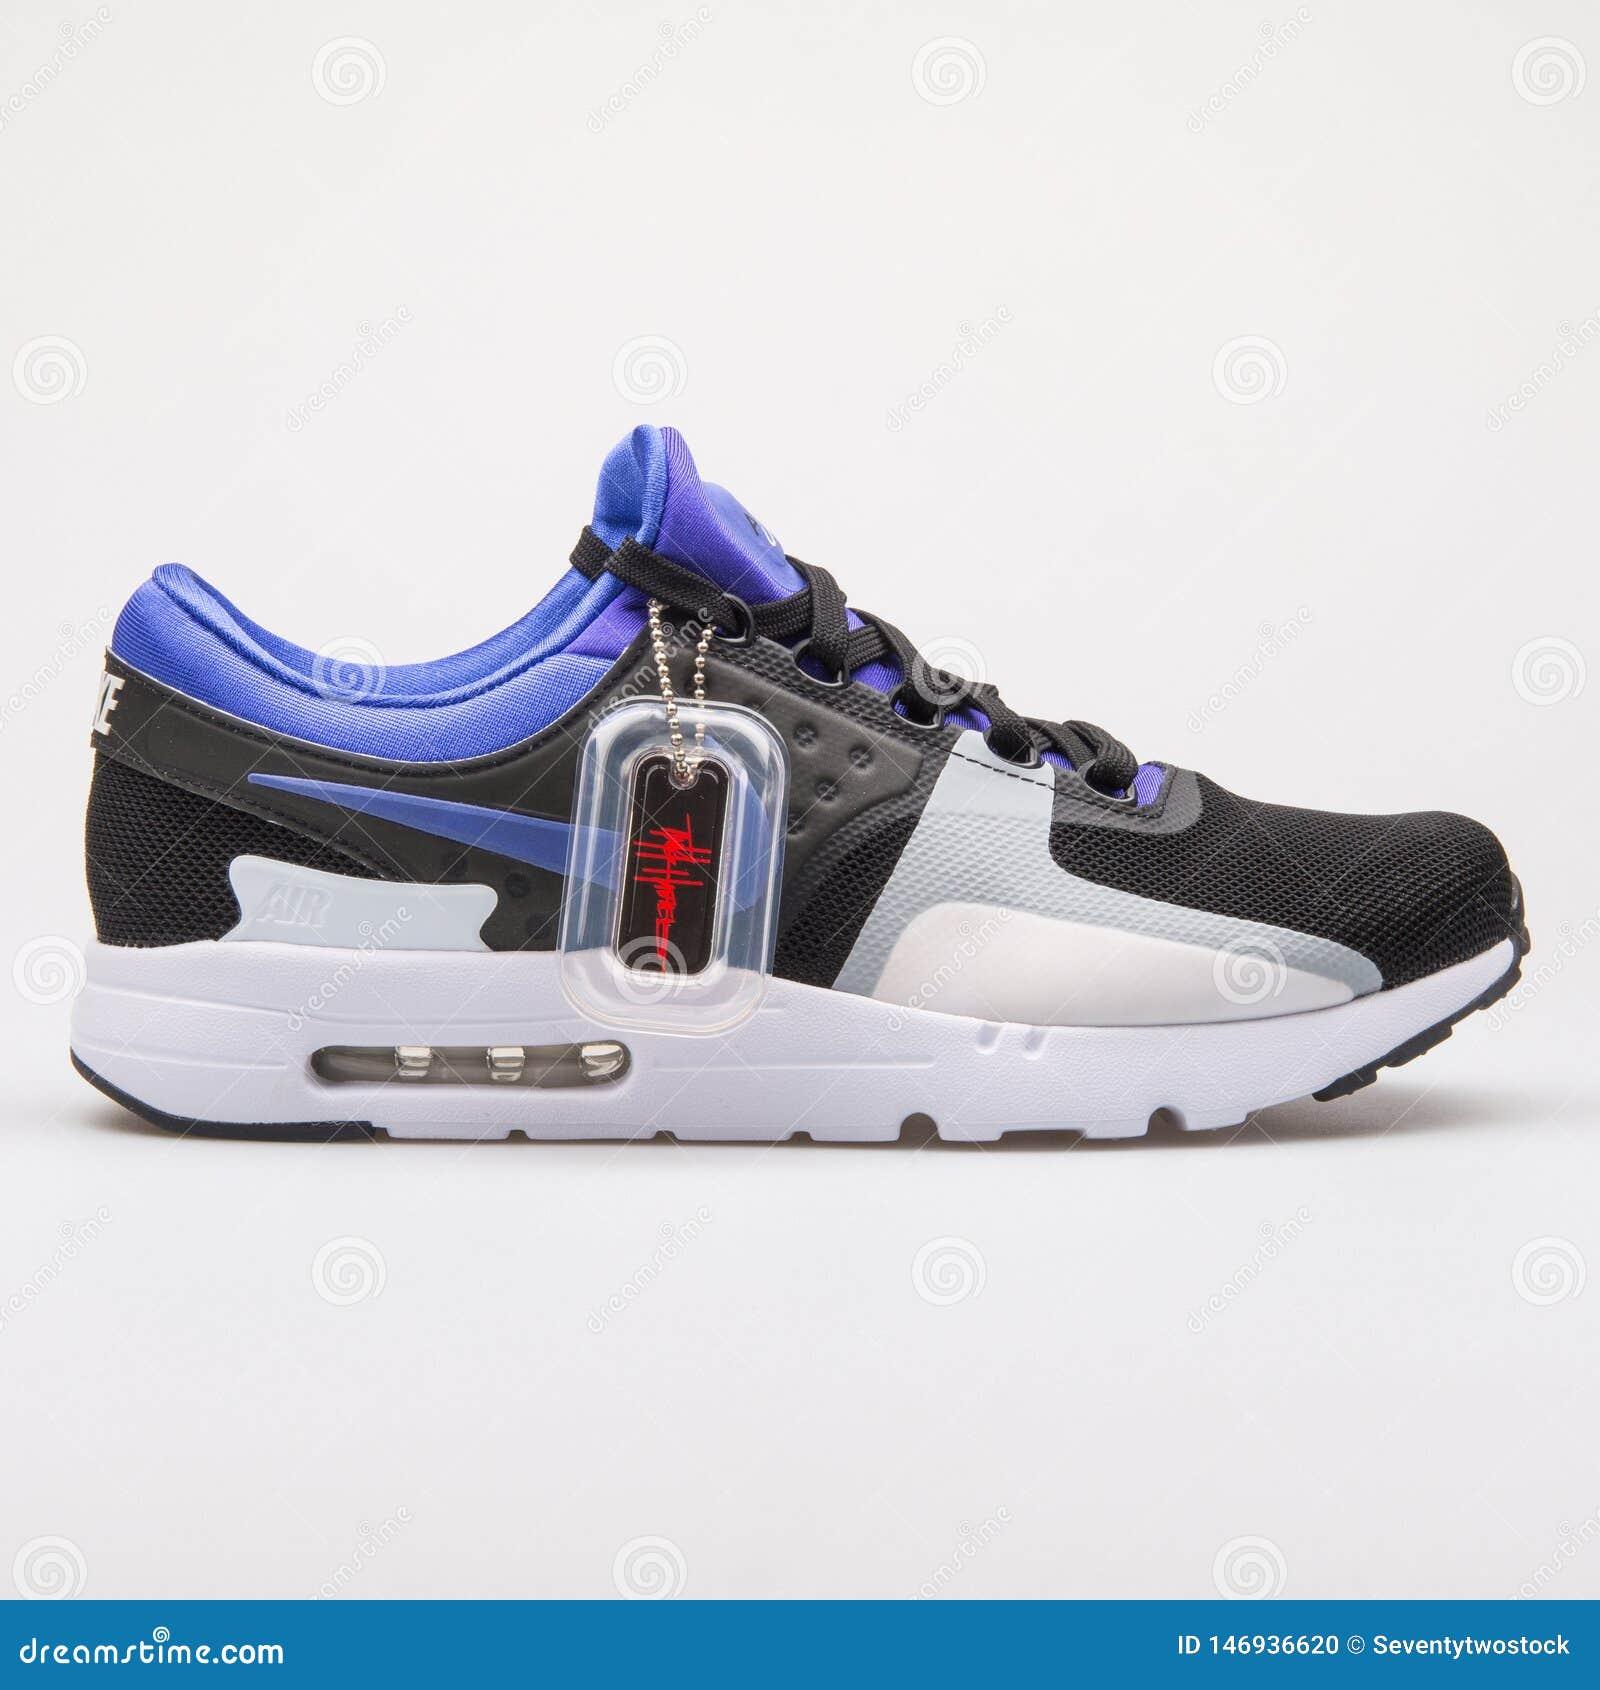 huge discount e481d e0f4b Nike Air Max Zero QS Black, Violet And White Sneaker ...